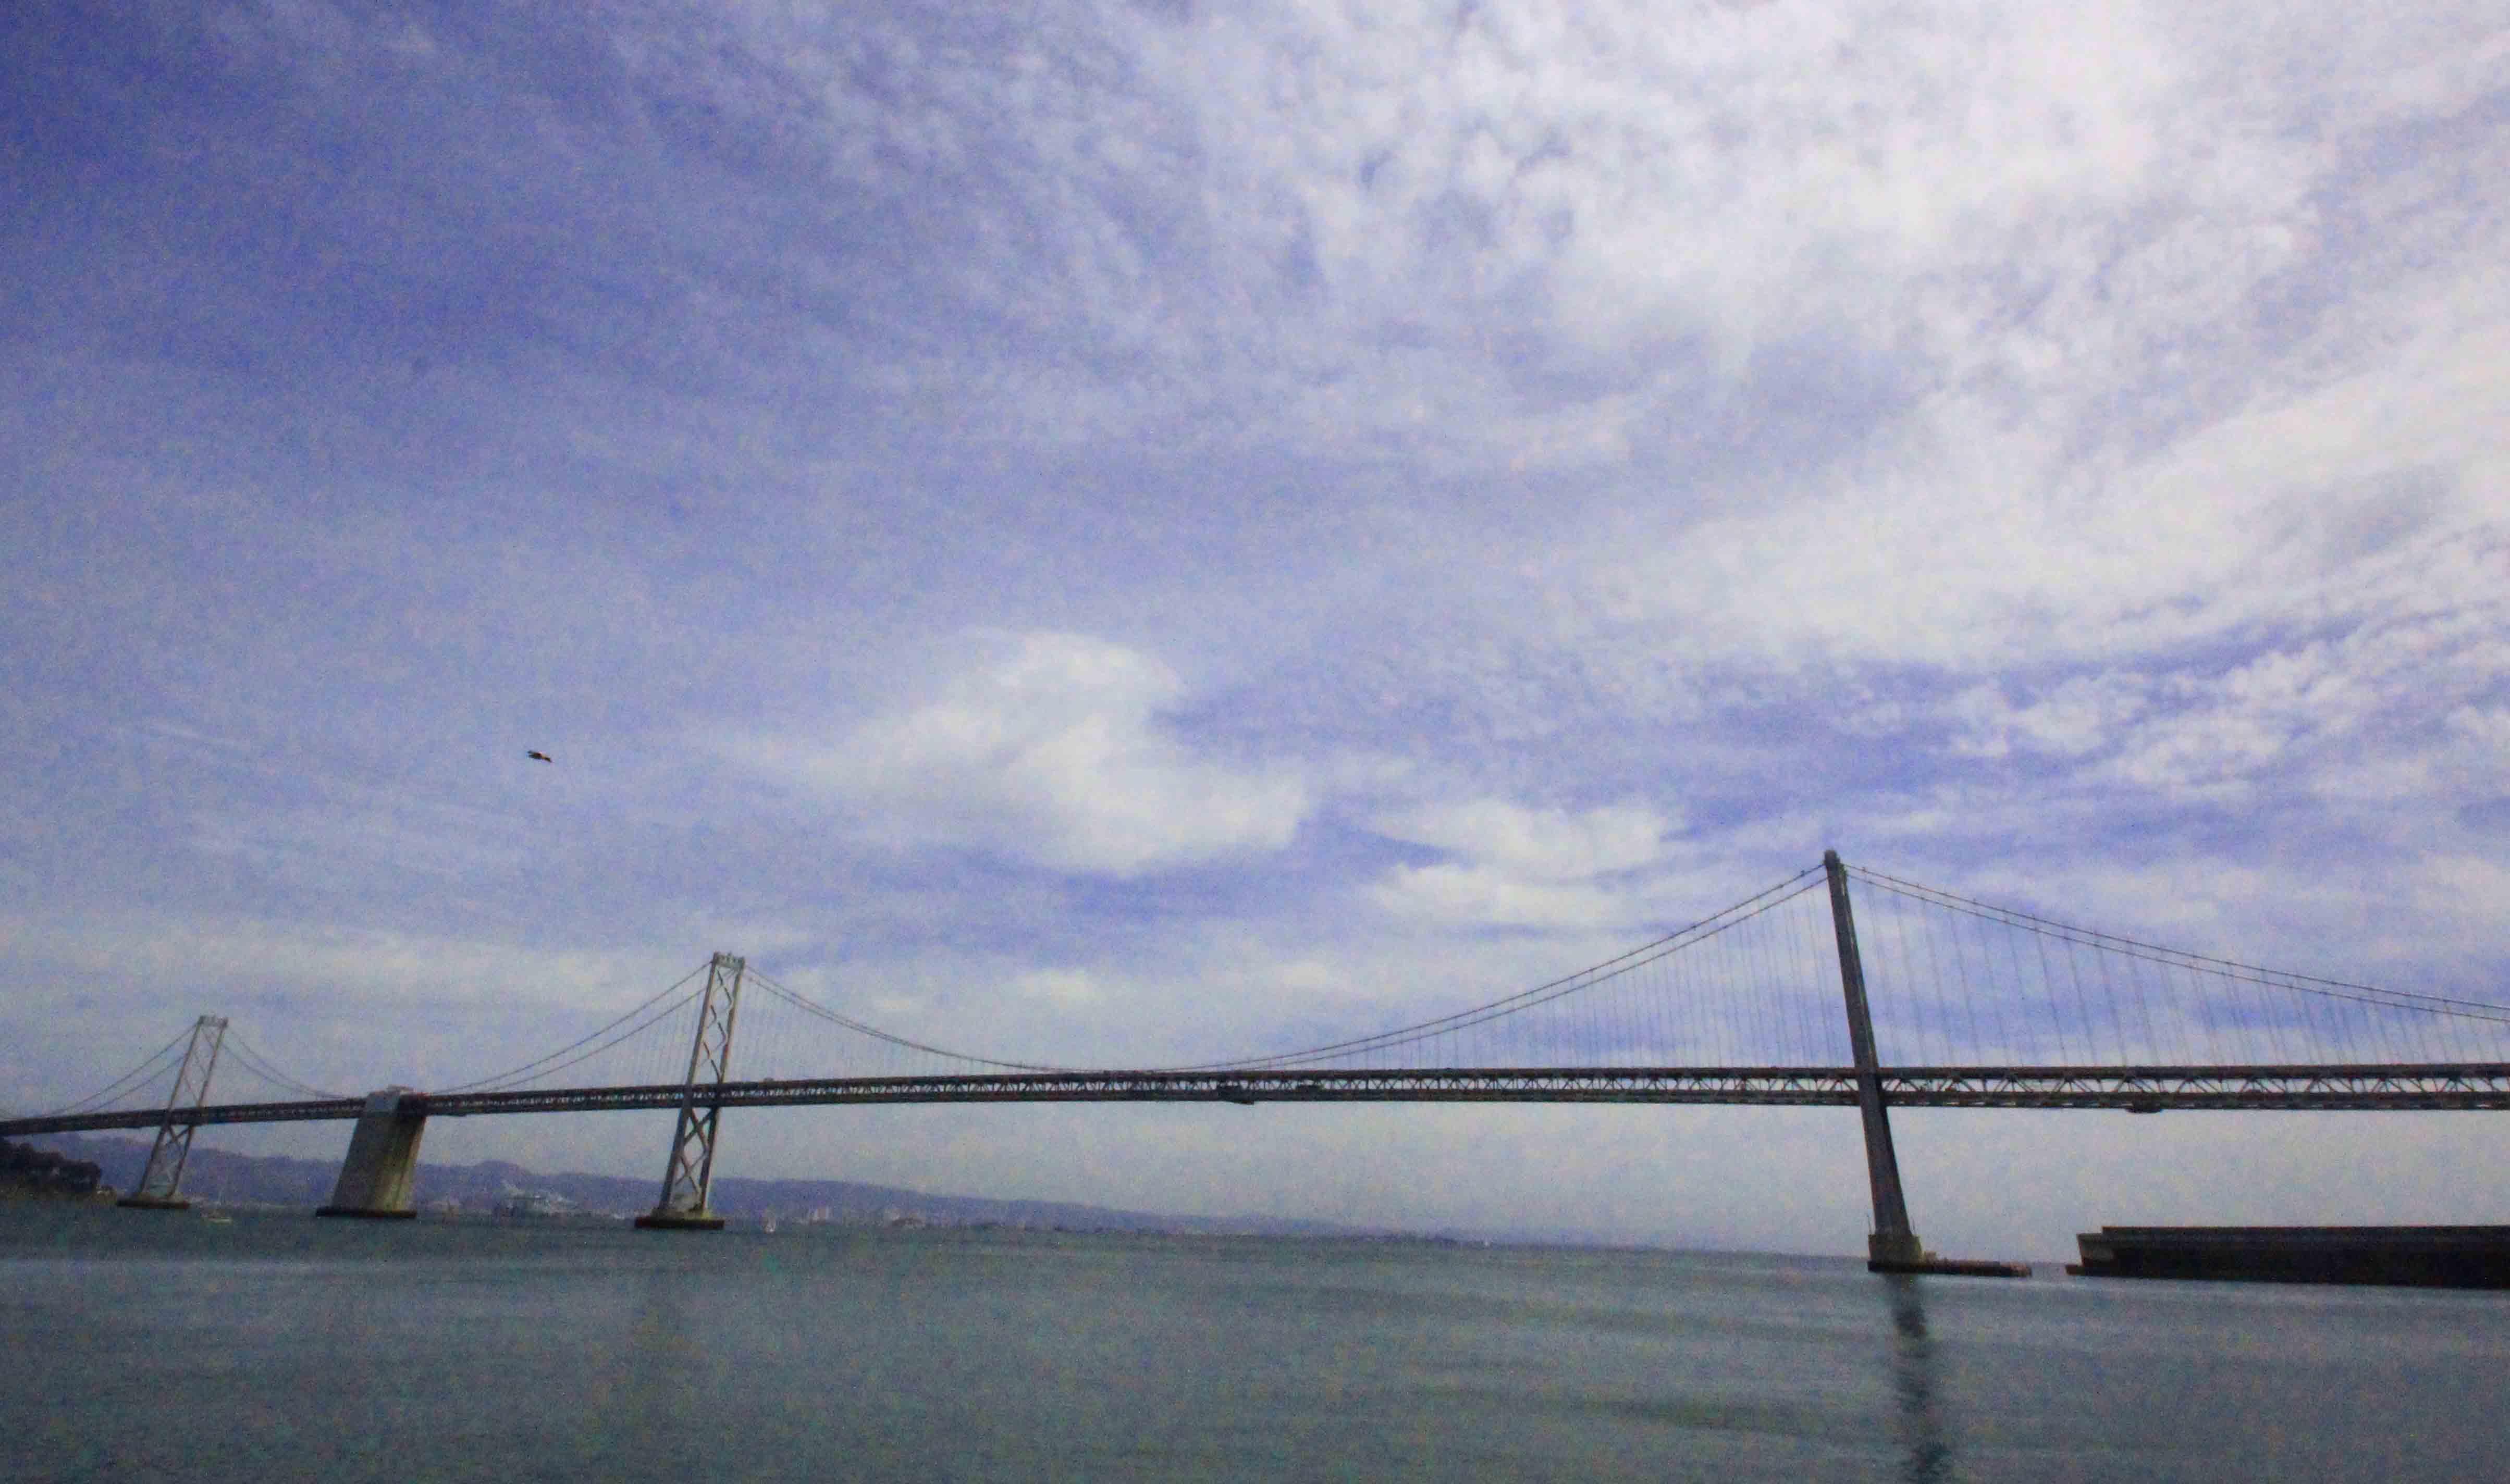 SF-GOLDEN gate bridge2 wide